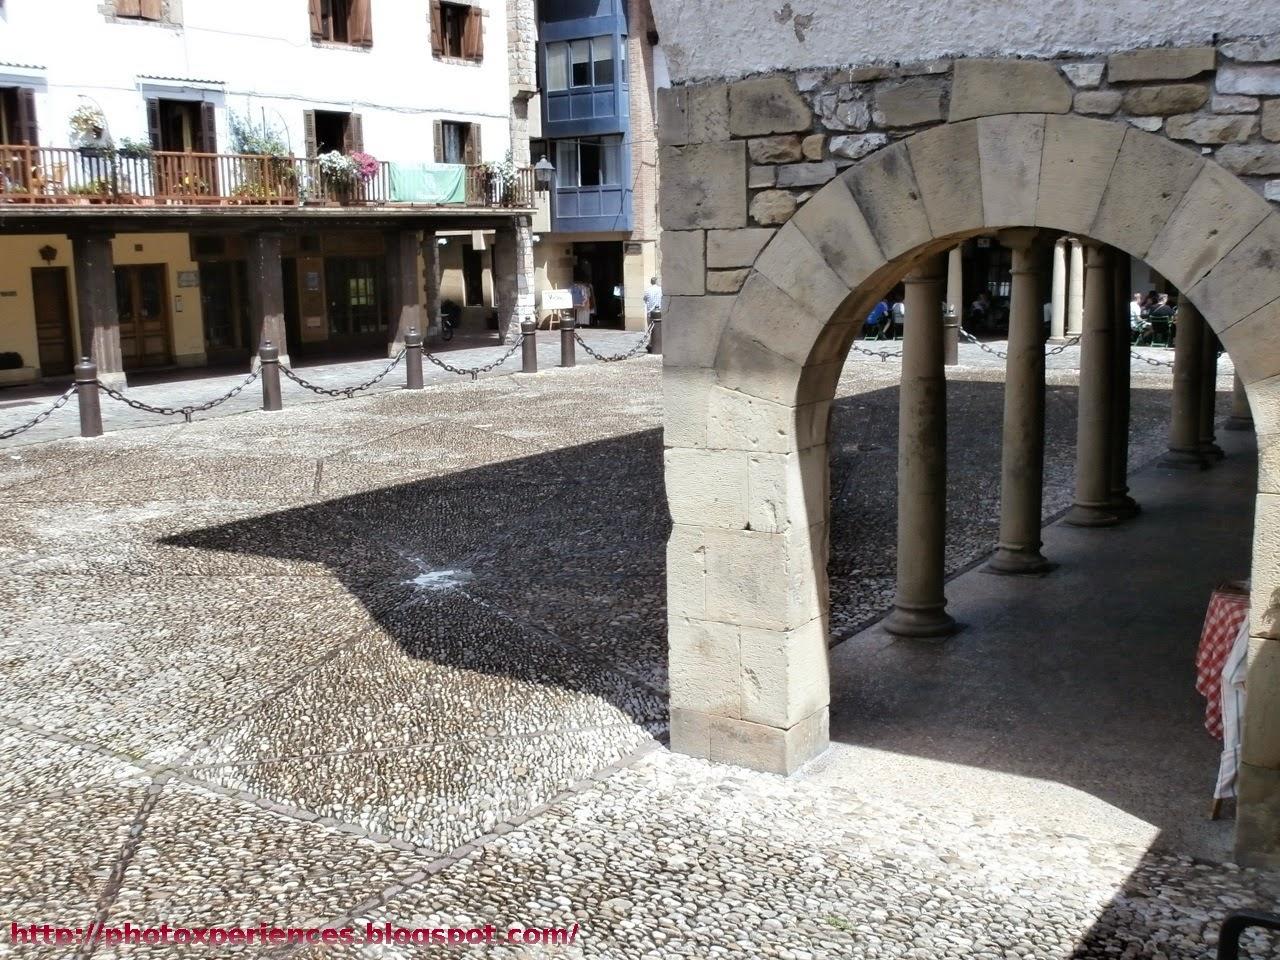 Soportales en la Plaza Gipuzkoa de Hondarribia - Fuenterrabía